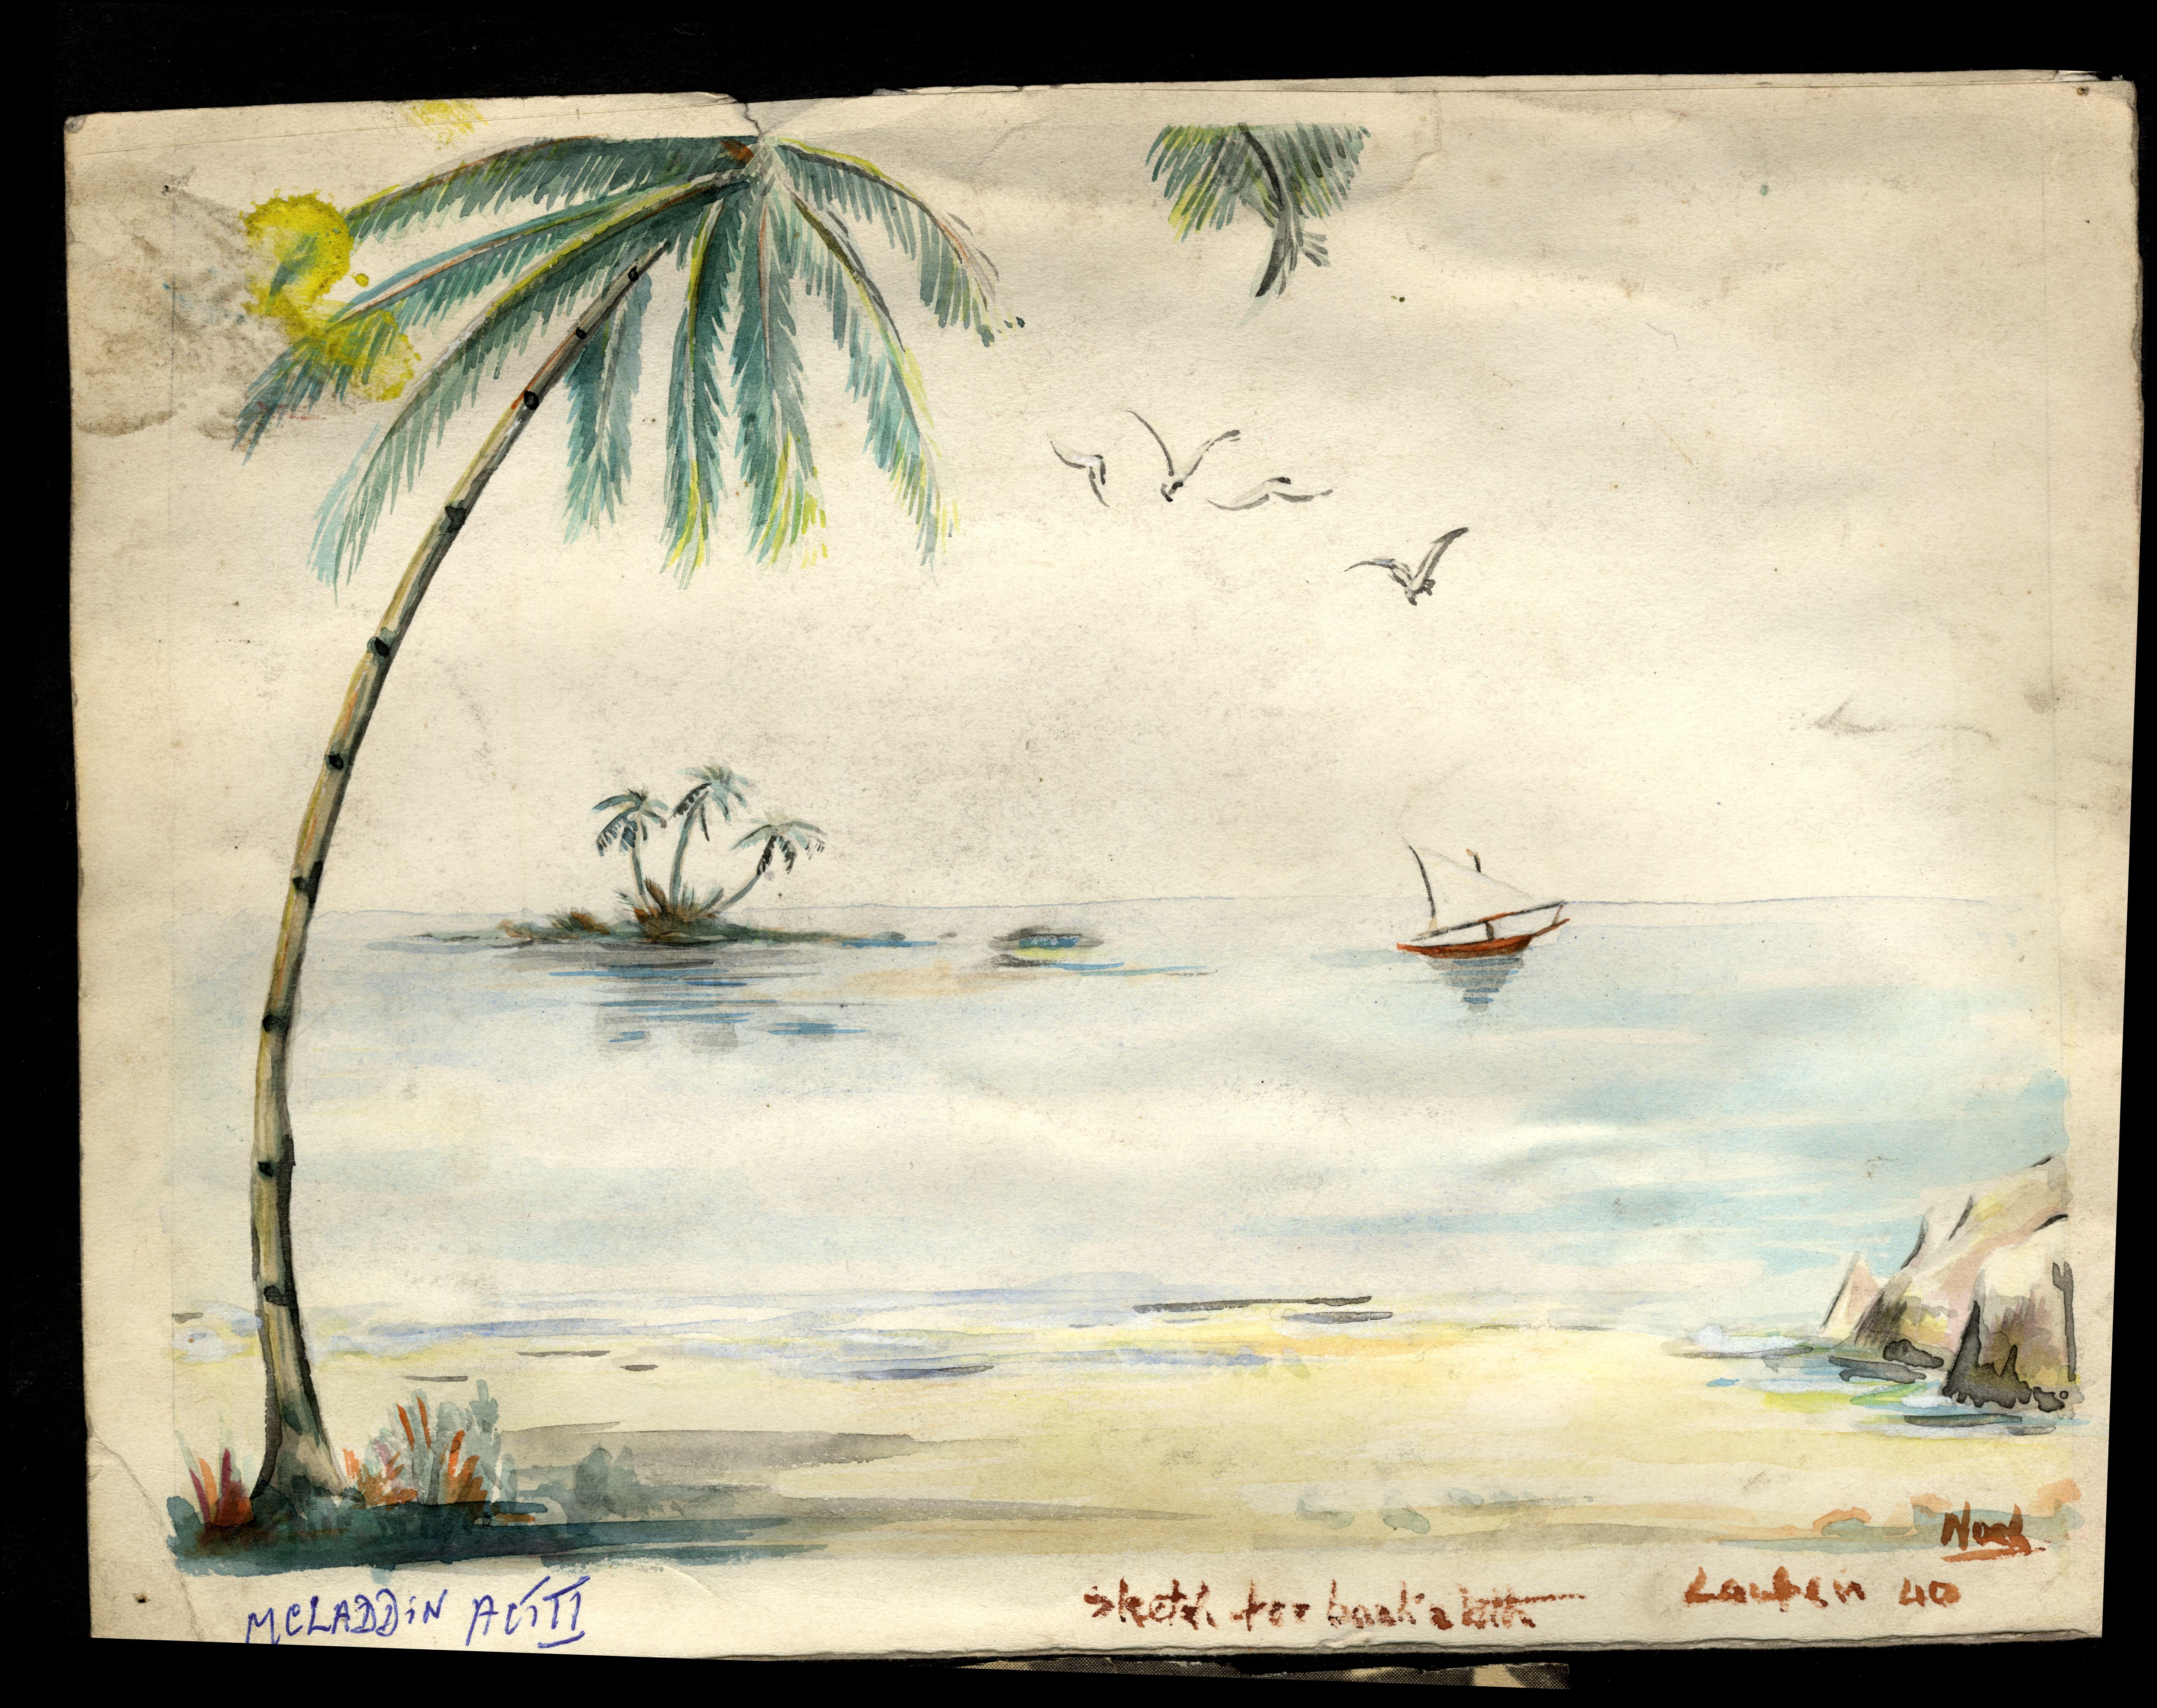 Watercolour set design for McLaddin, Act III